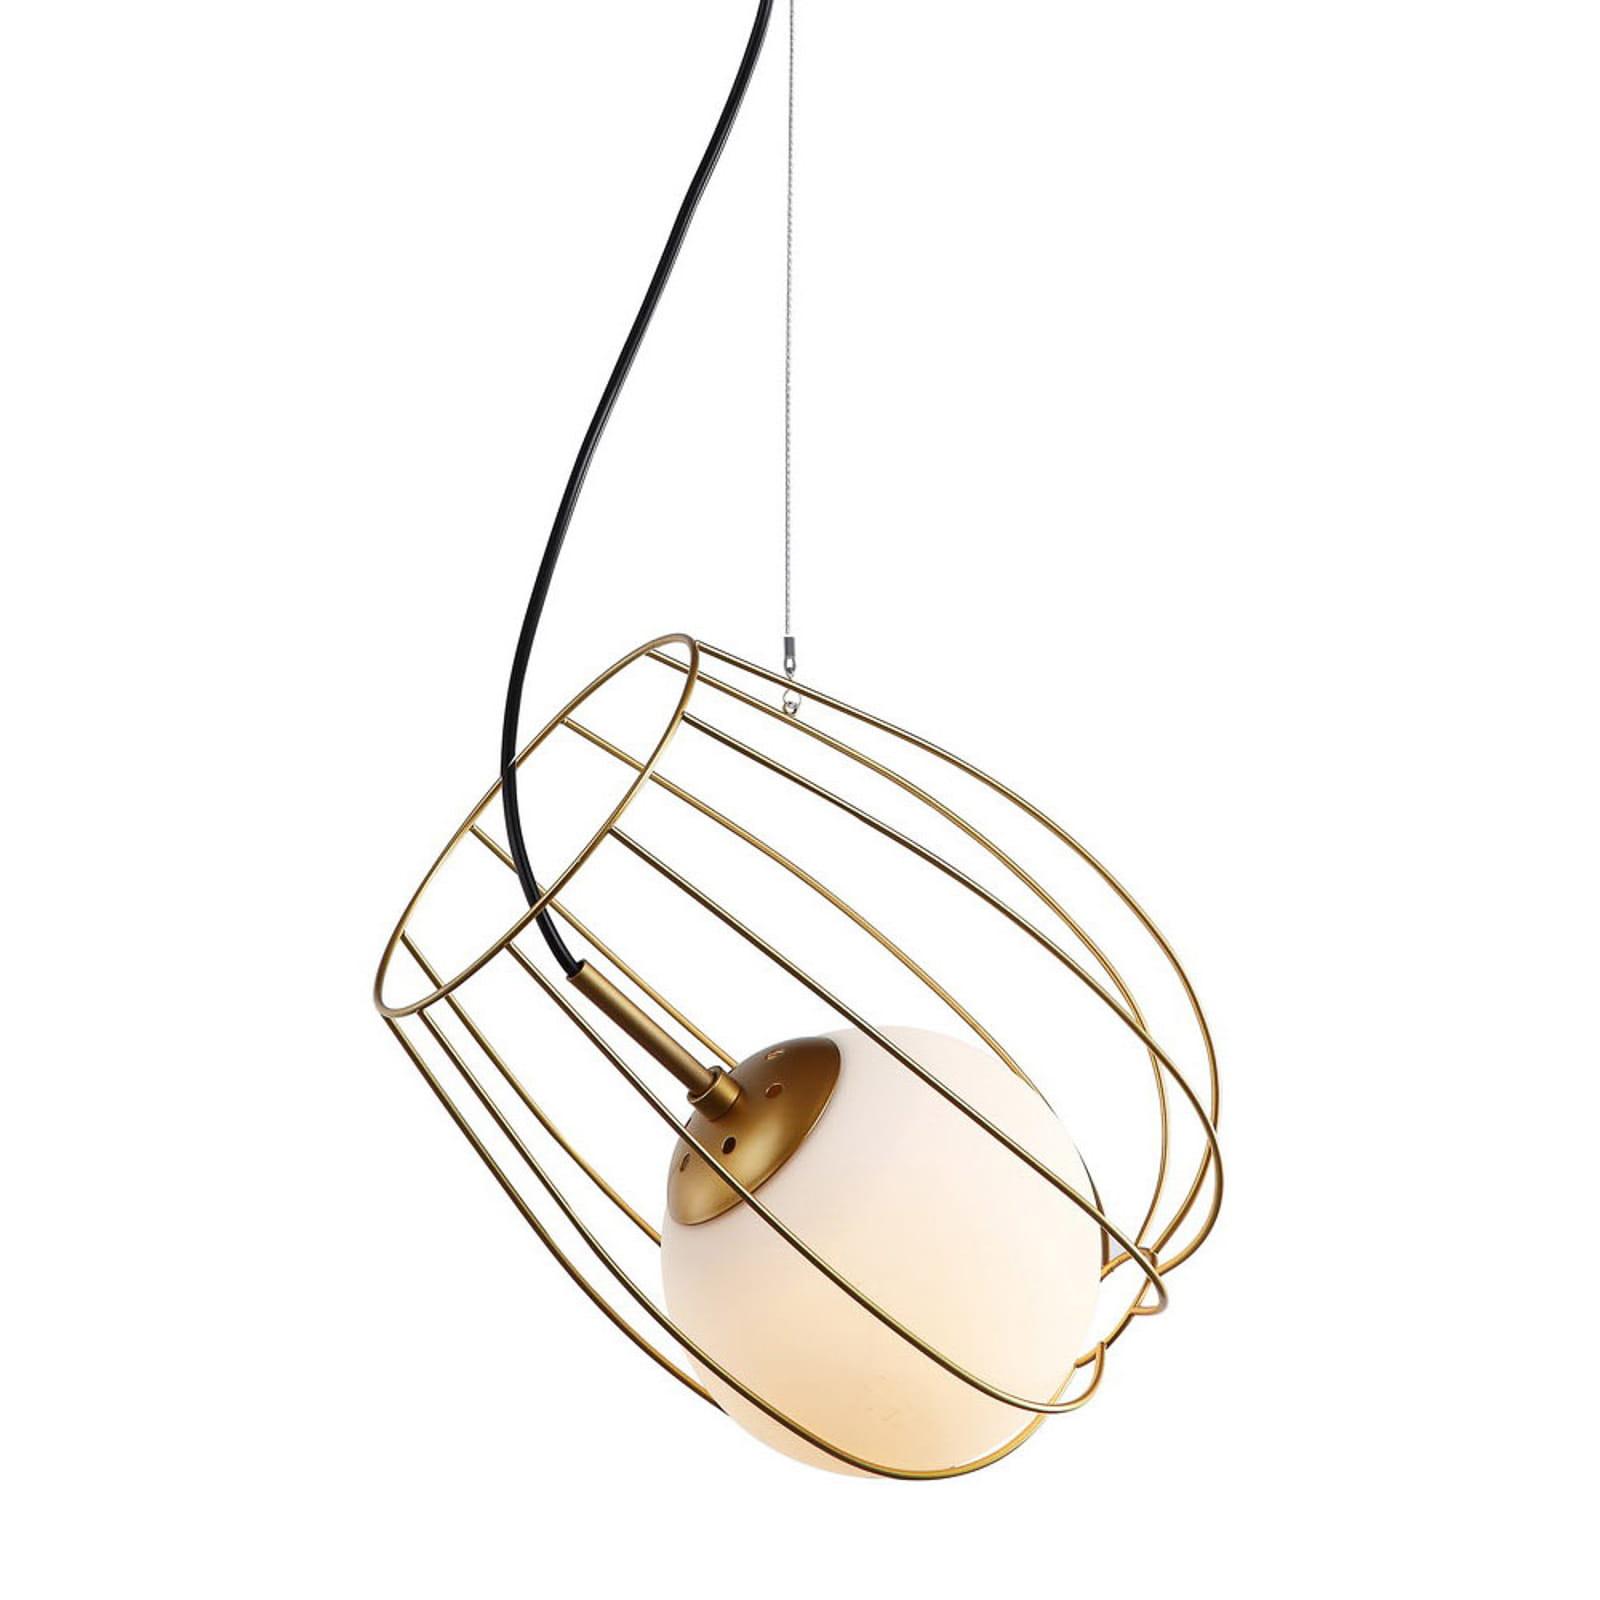 Lampa Sufitowa Melisa Zlota Kula Italux Mdm 3943 1 Gd